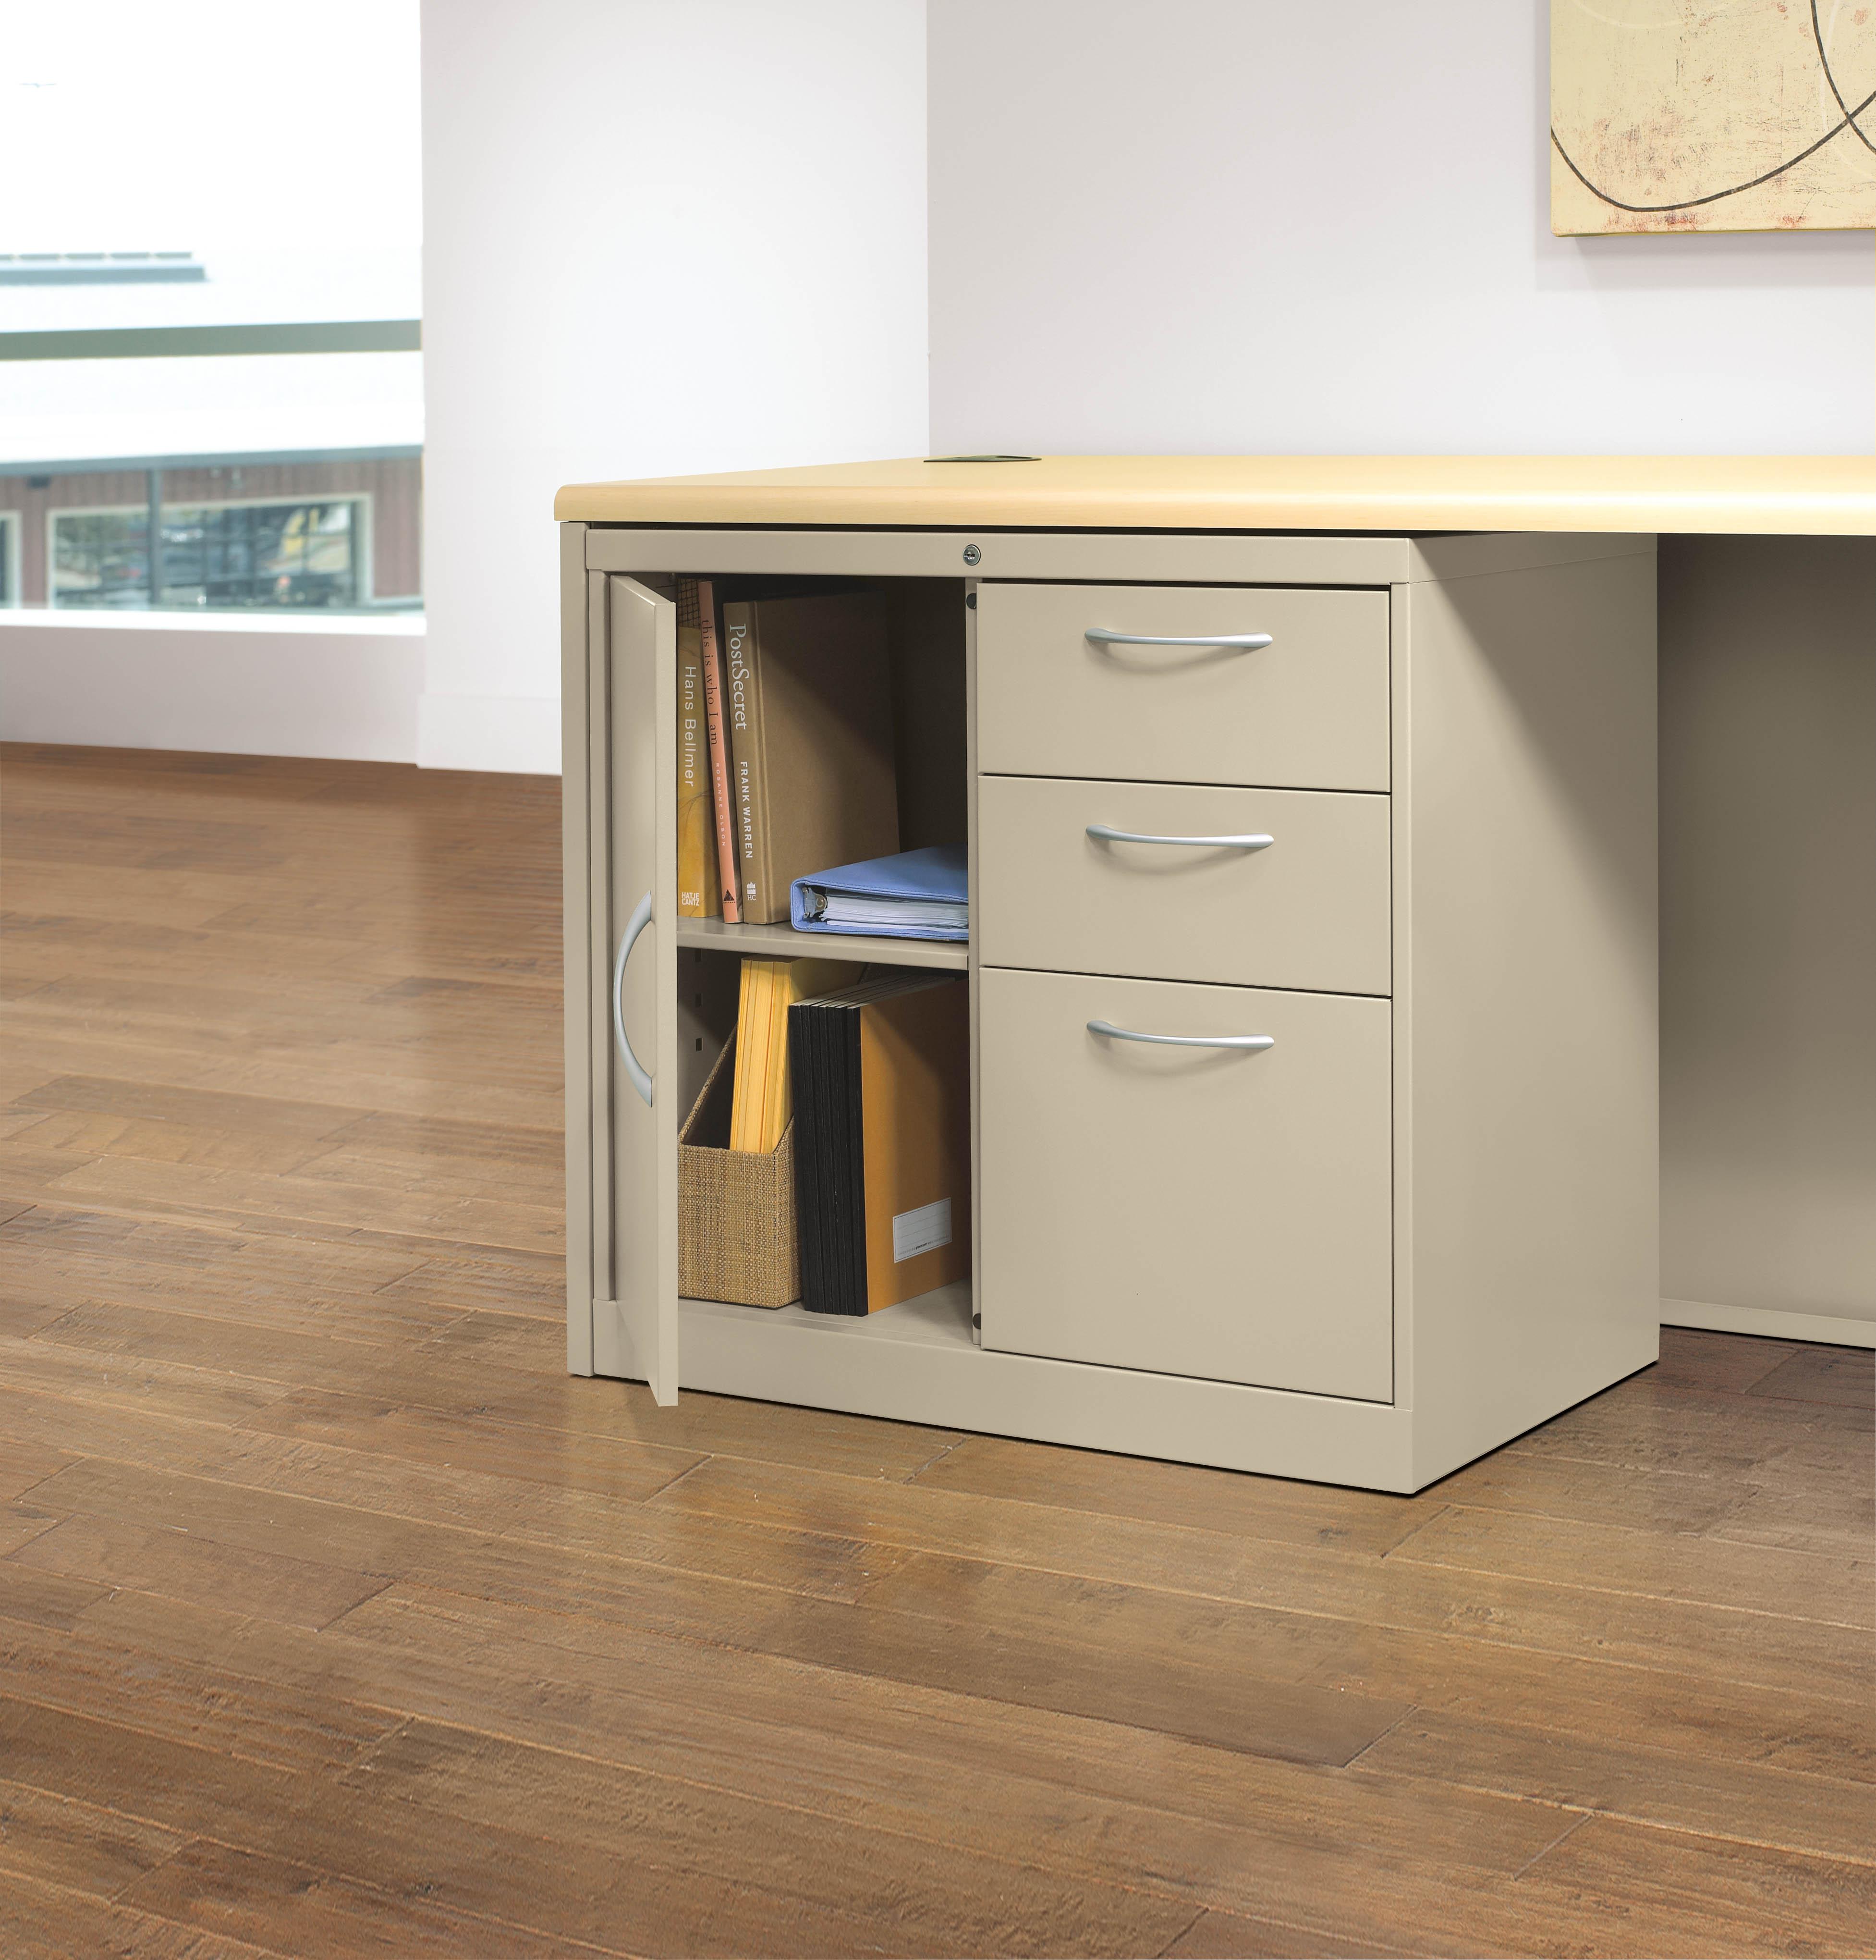 Kitchen Cabinets Wholesale Michigan: File Cabinets & Storage